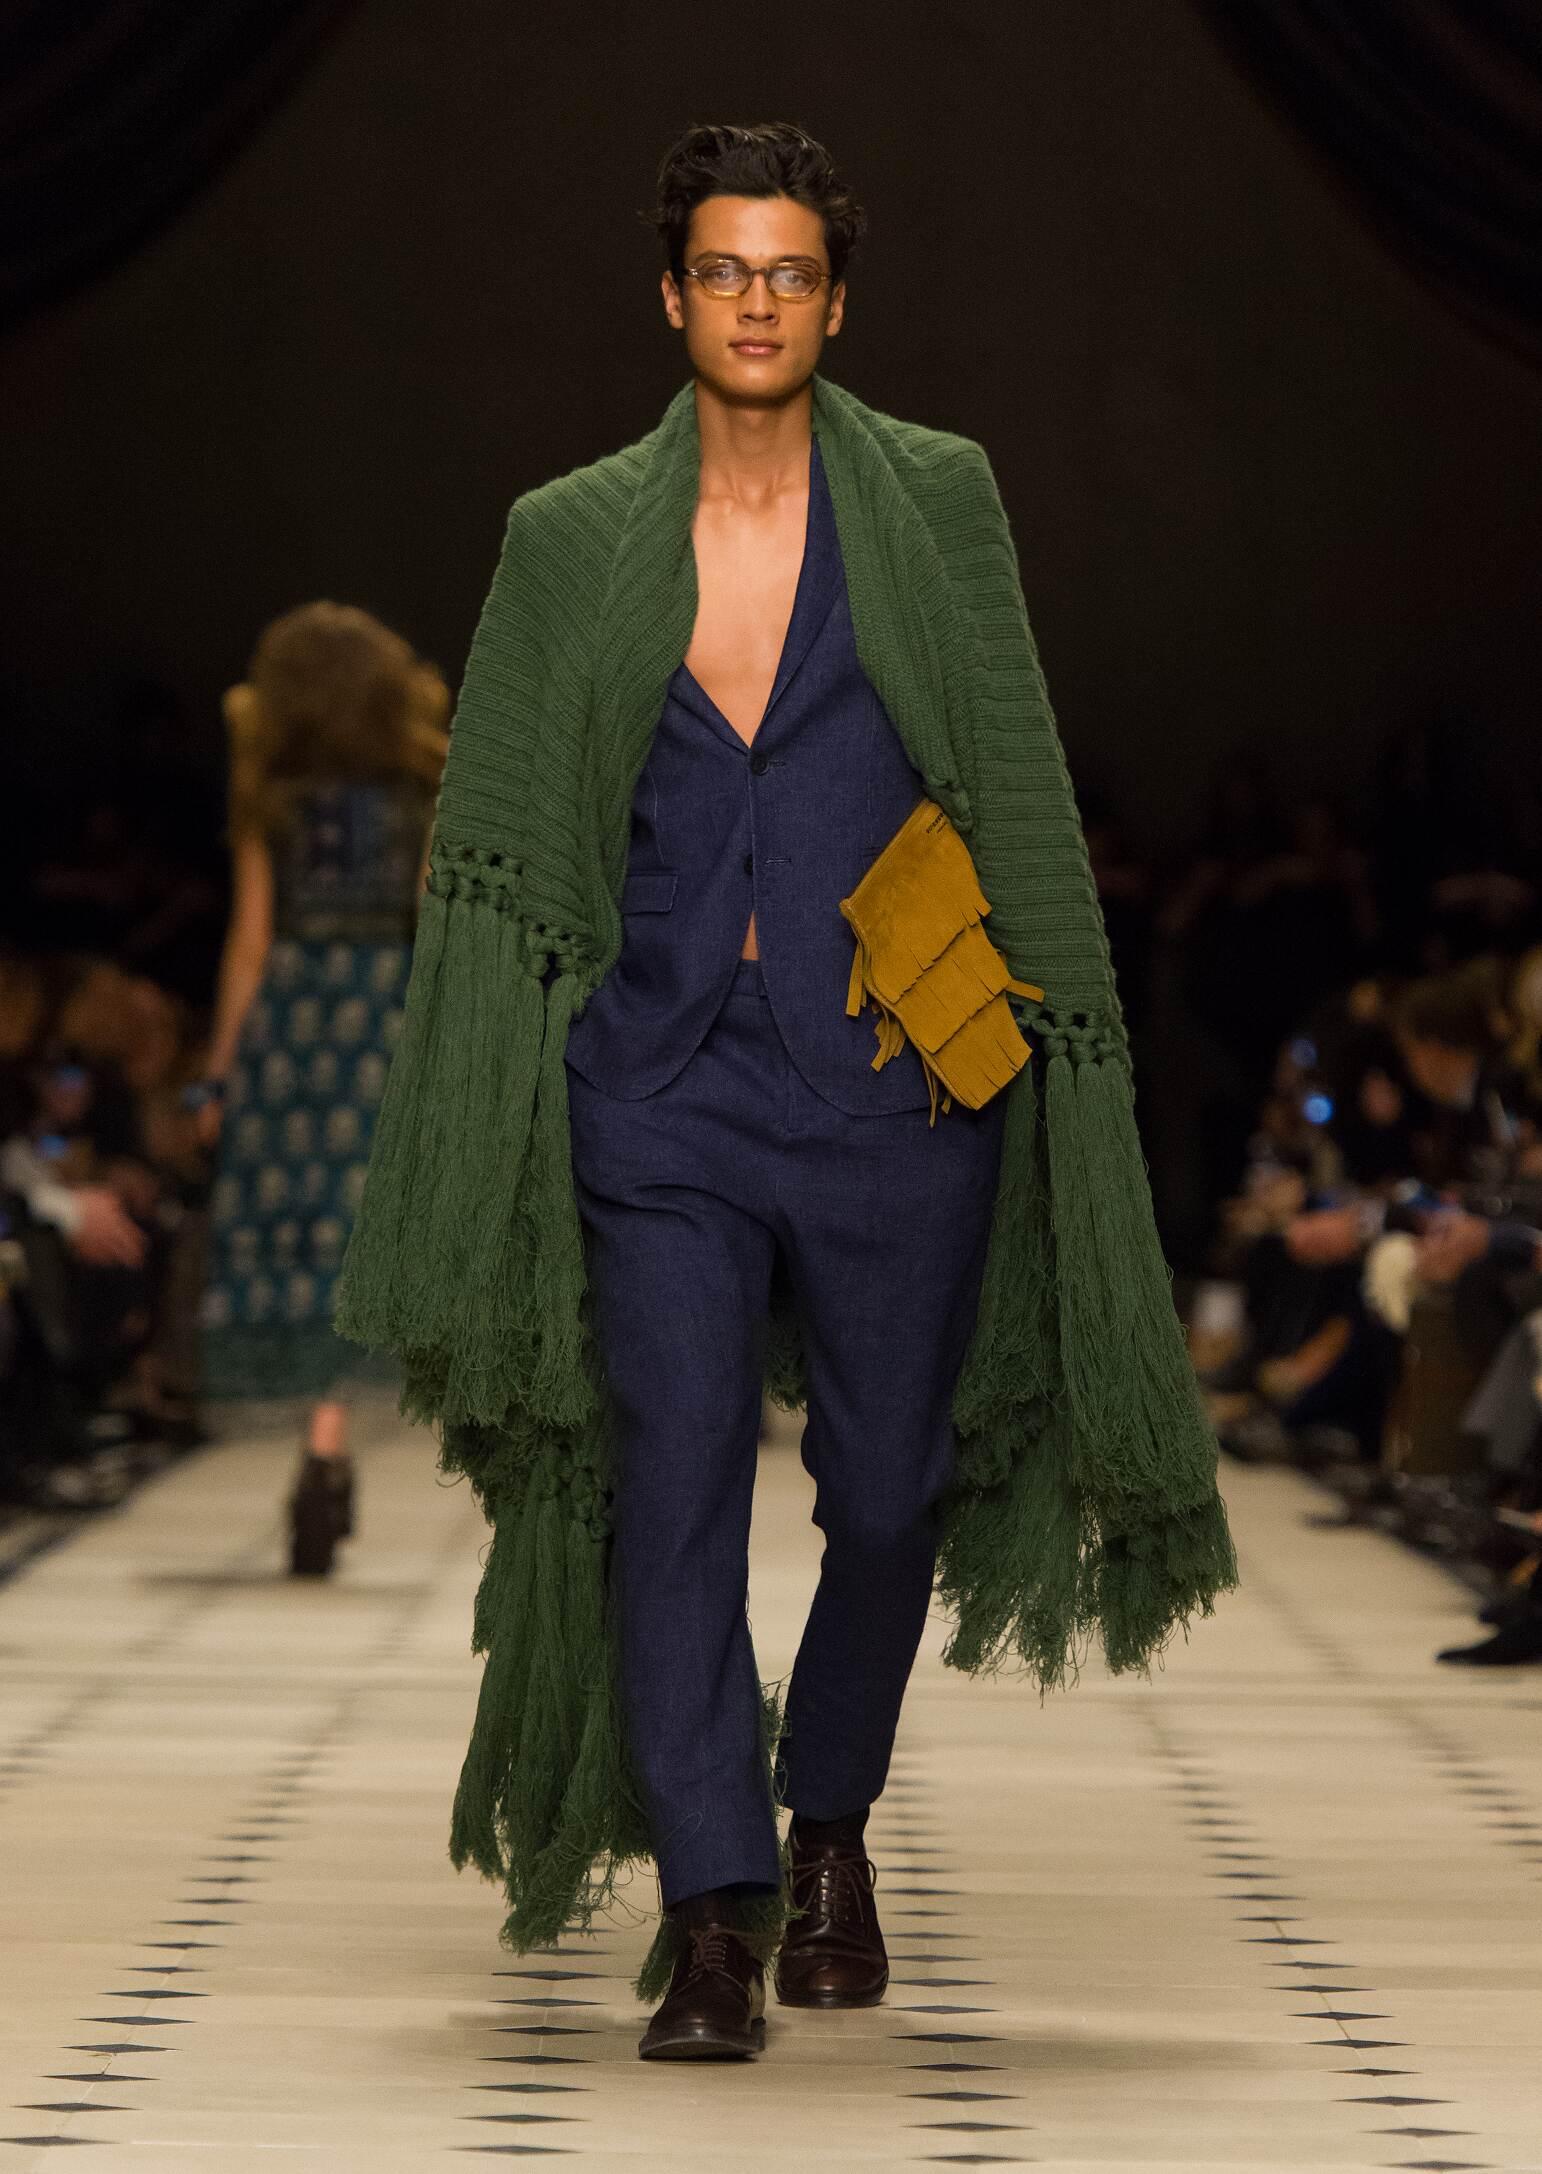 Burberry Prorsum Fall Winter 2015 16 Menswear Collection London Fashion Week Fashion Show